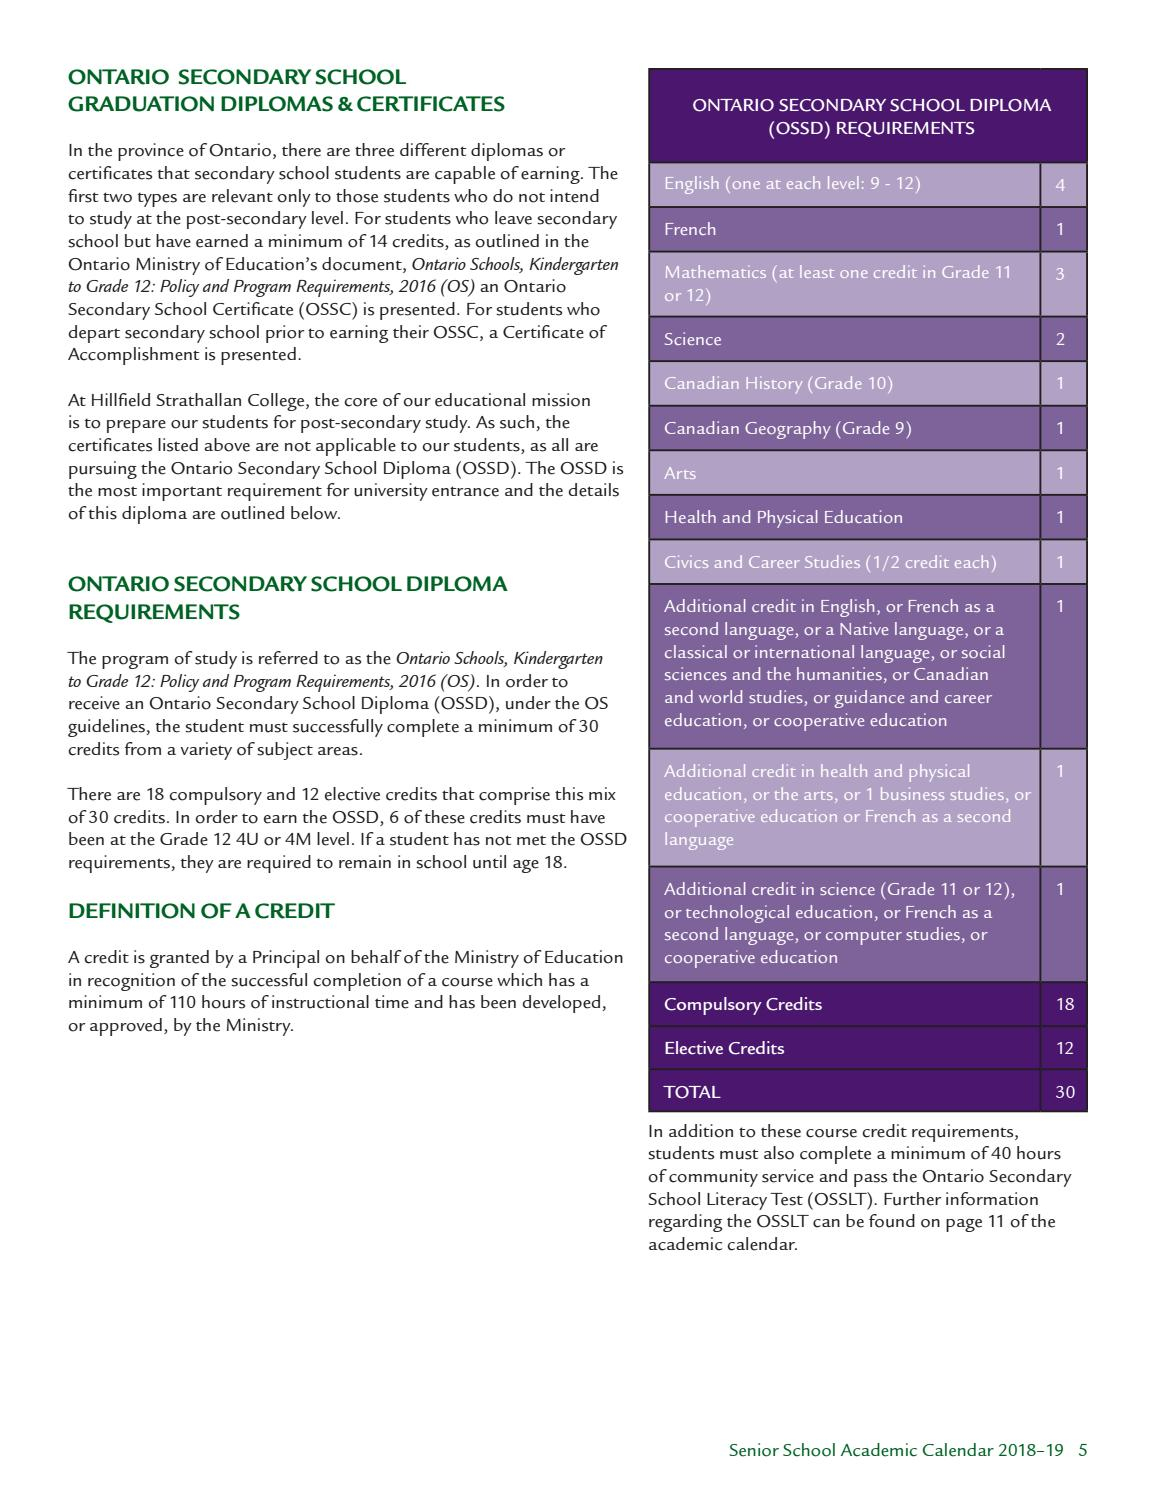 Senior School Course Calendar 2018-19 by Hillfield Strathallan